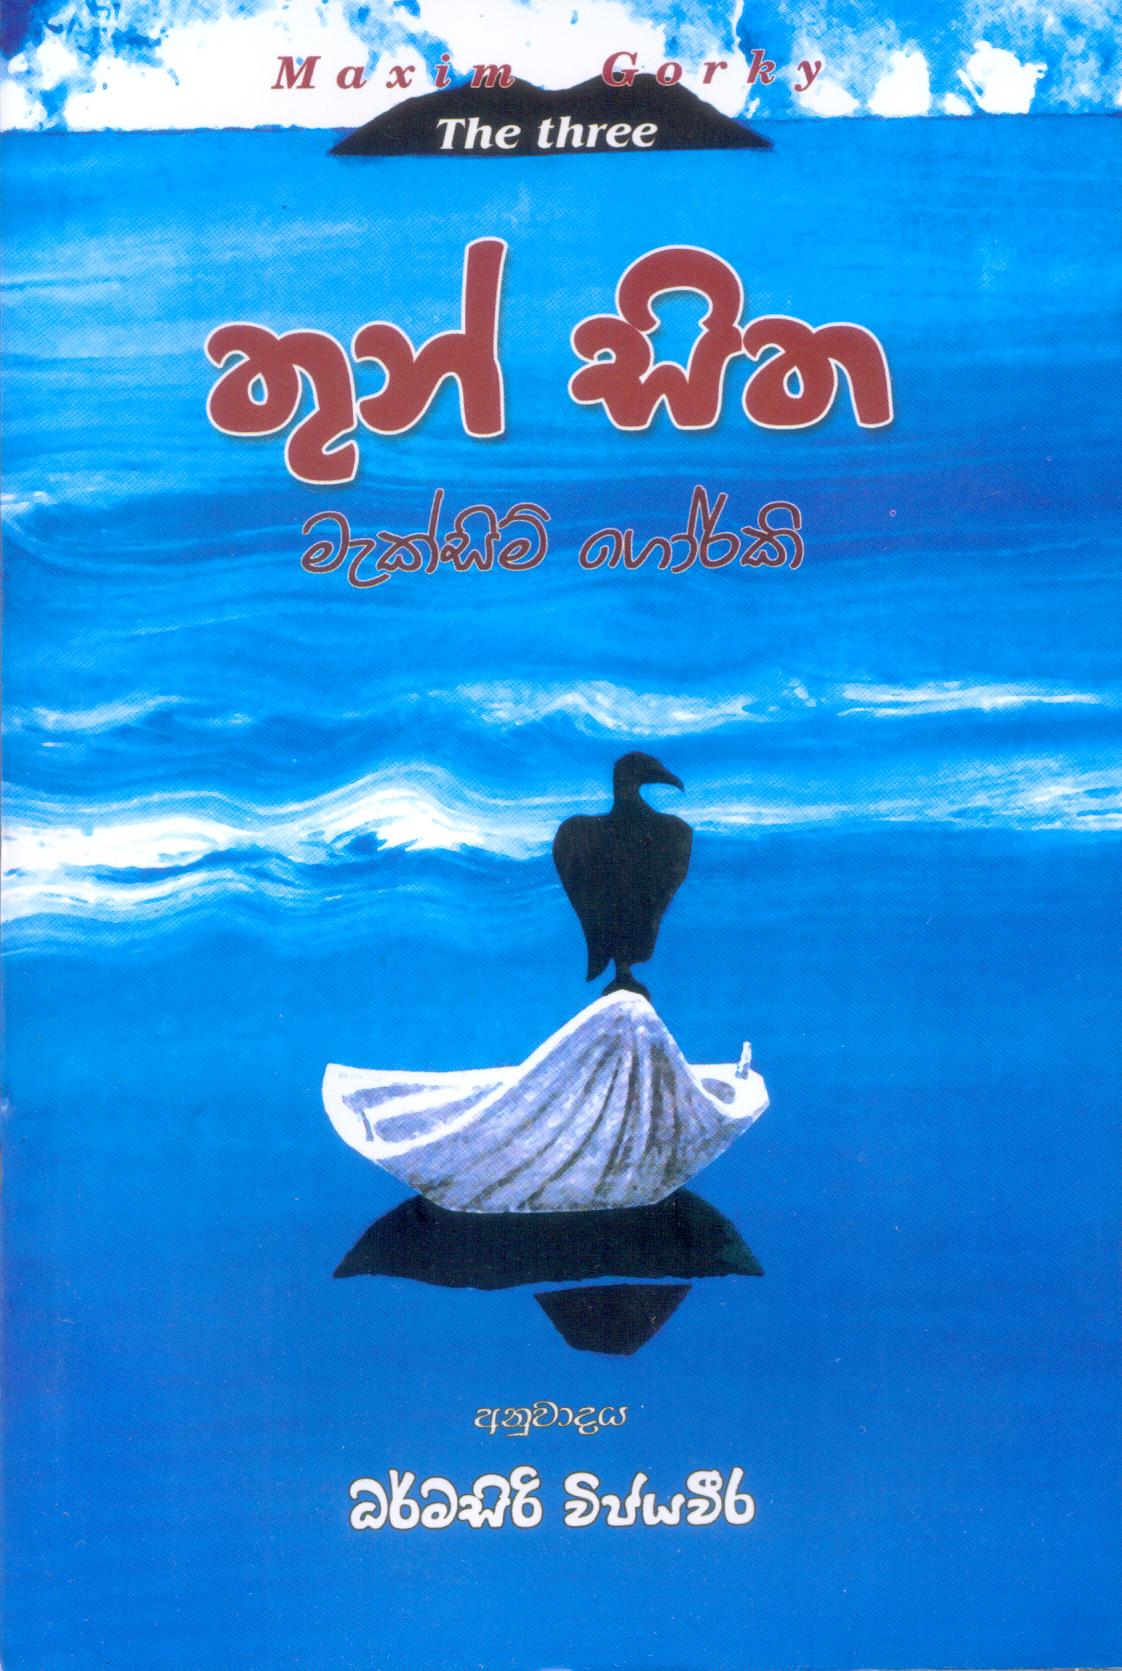 Thun Sitha